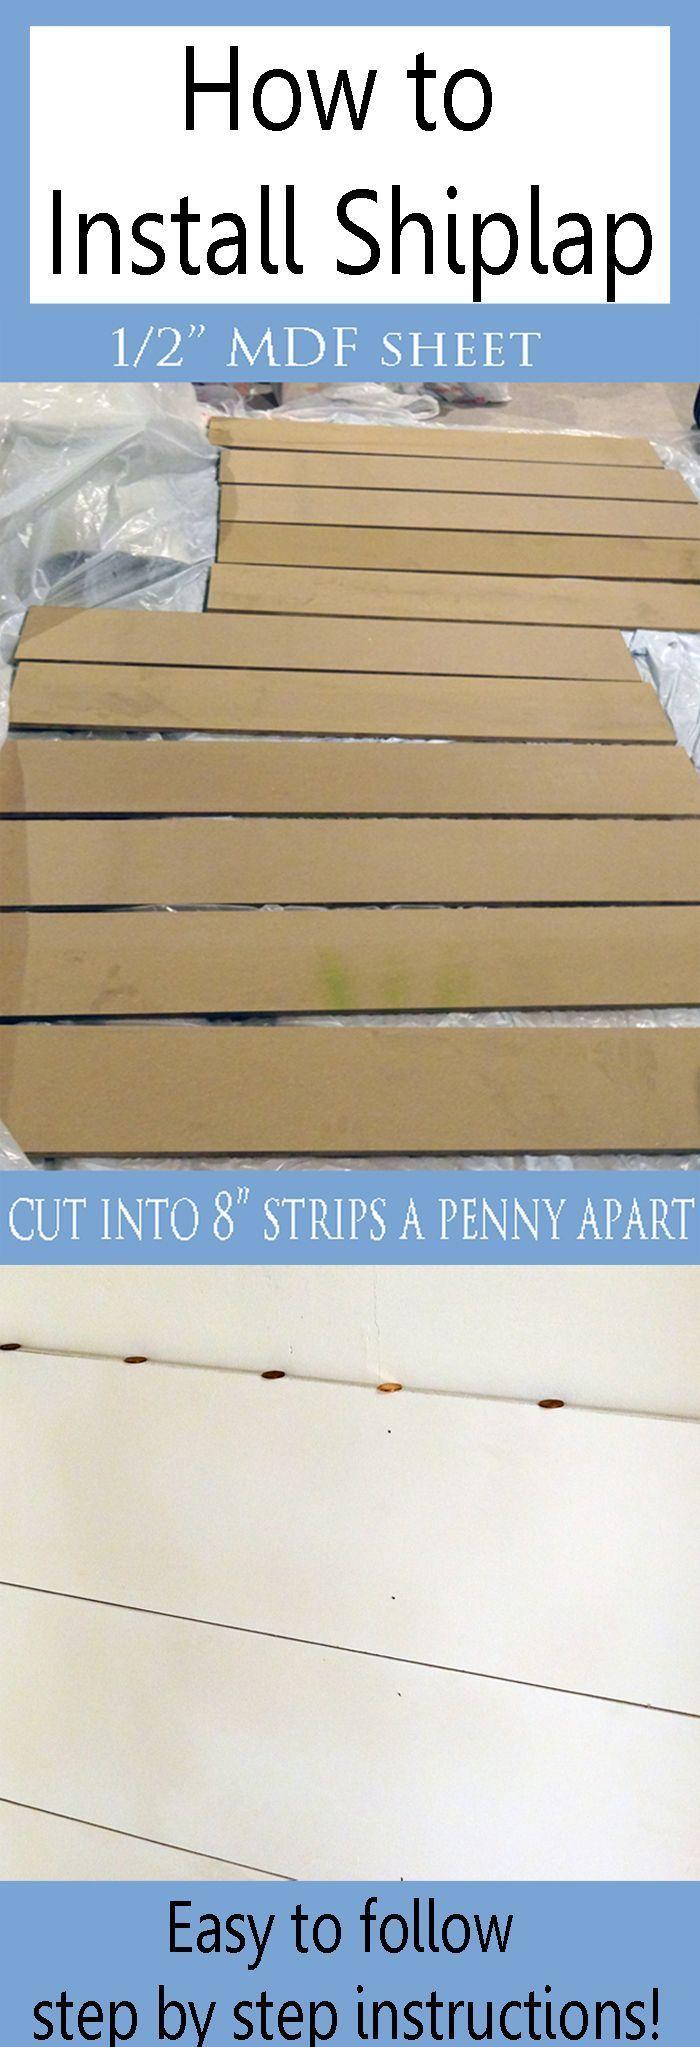 best 25 installing shiplap ideas on pinterest diy shiplap walls ship lap walls and ship lap. Black Bedroom Furniture Sets. Home Design Ideas